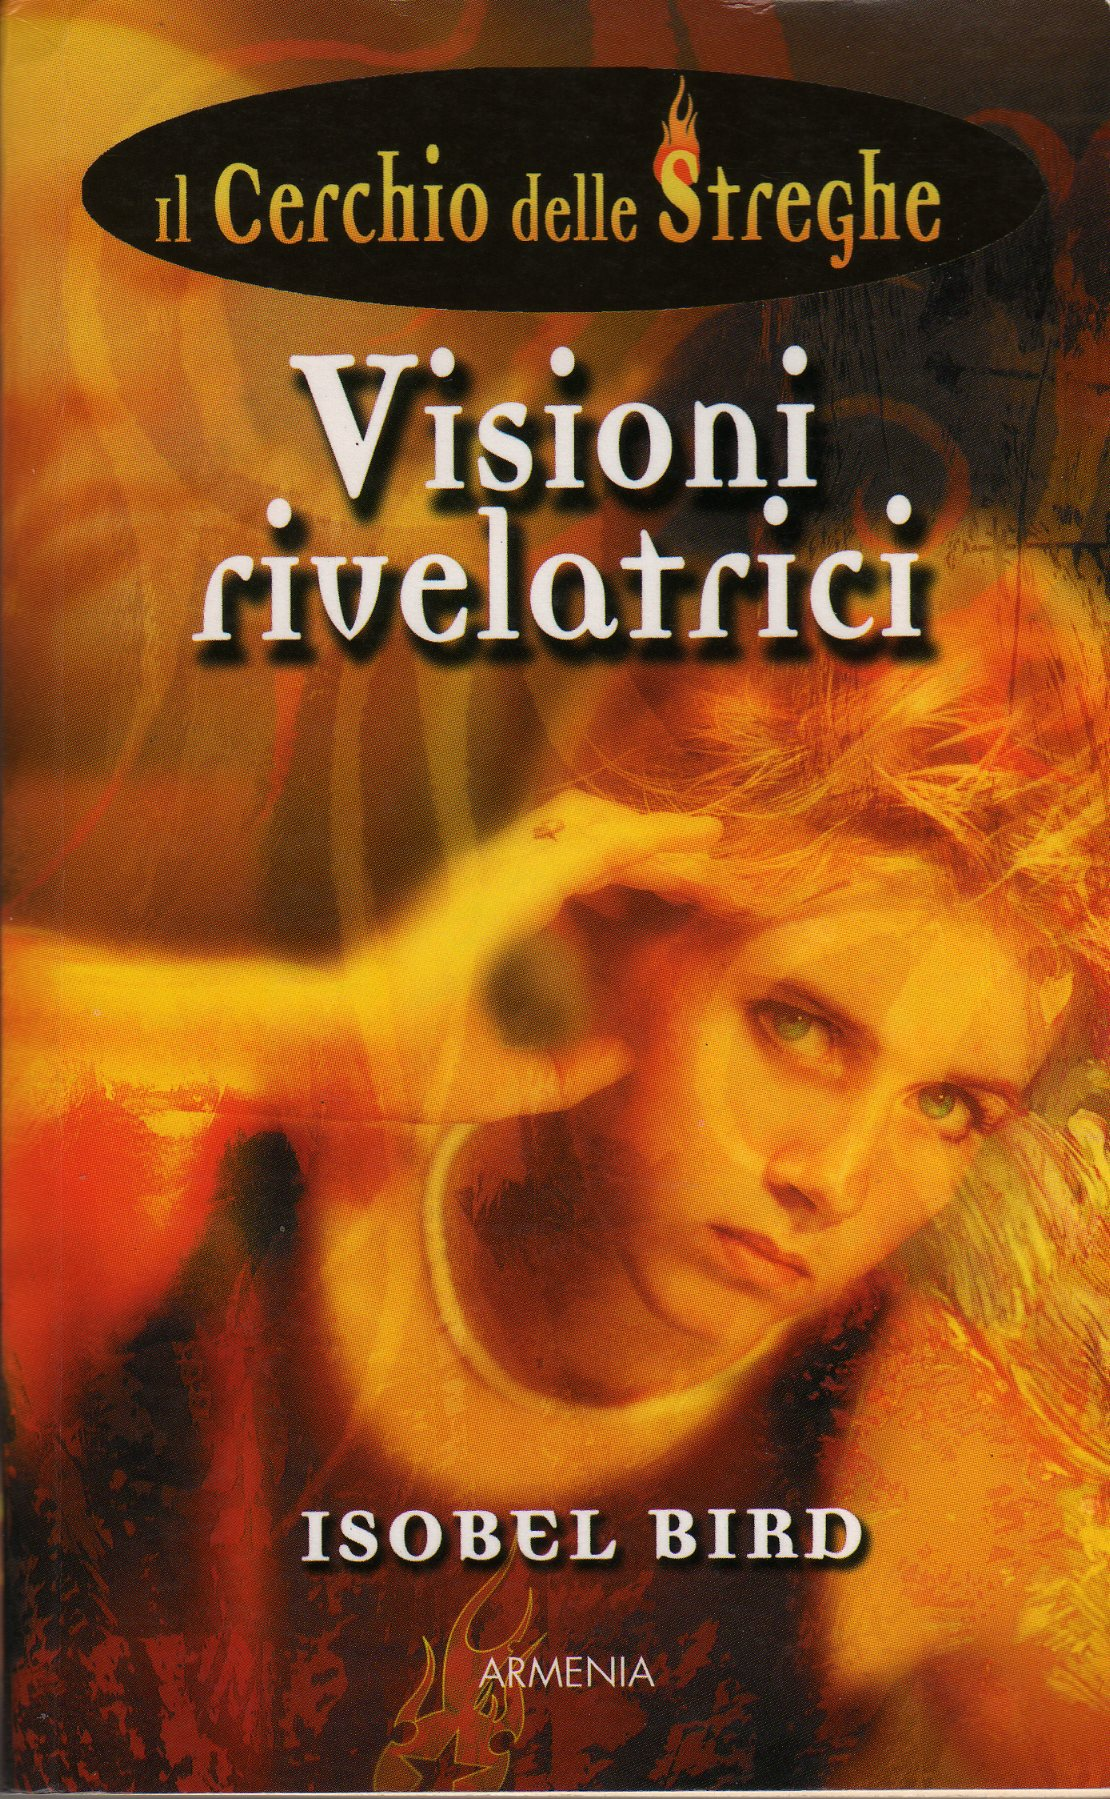 Visioni rivelatrici